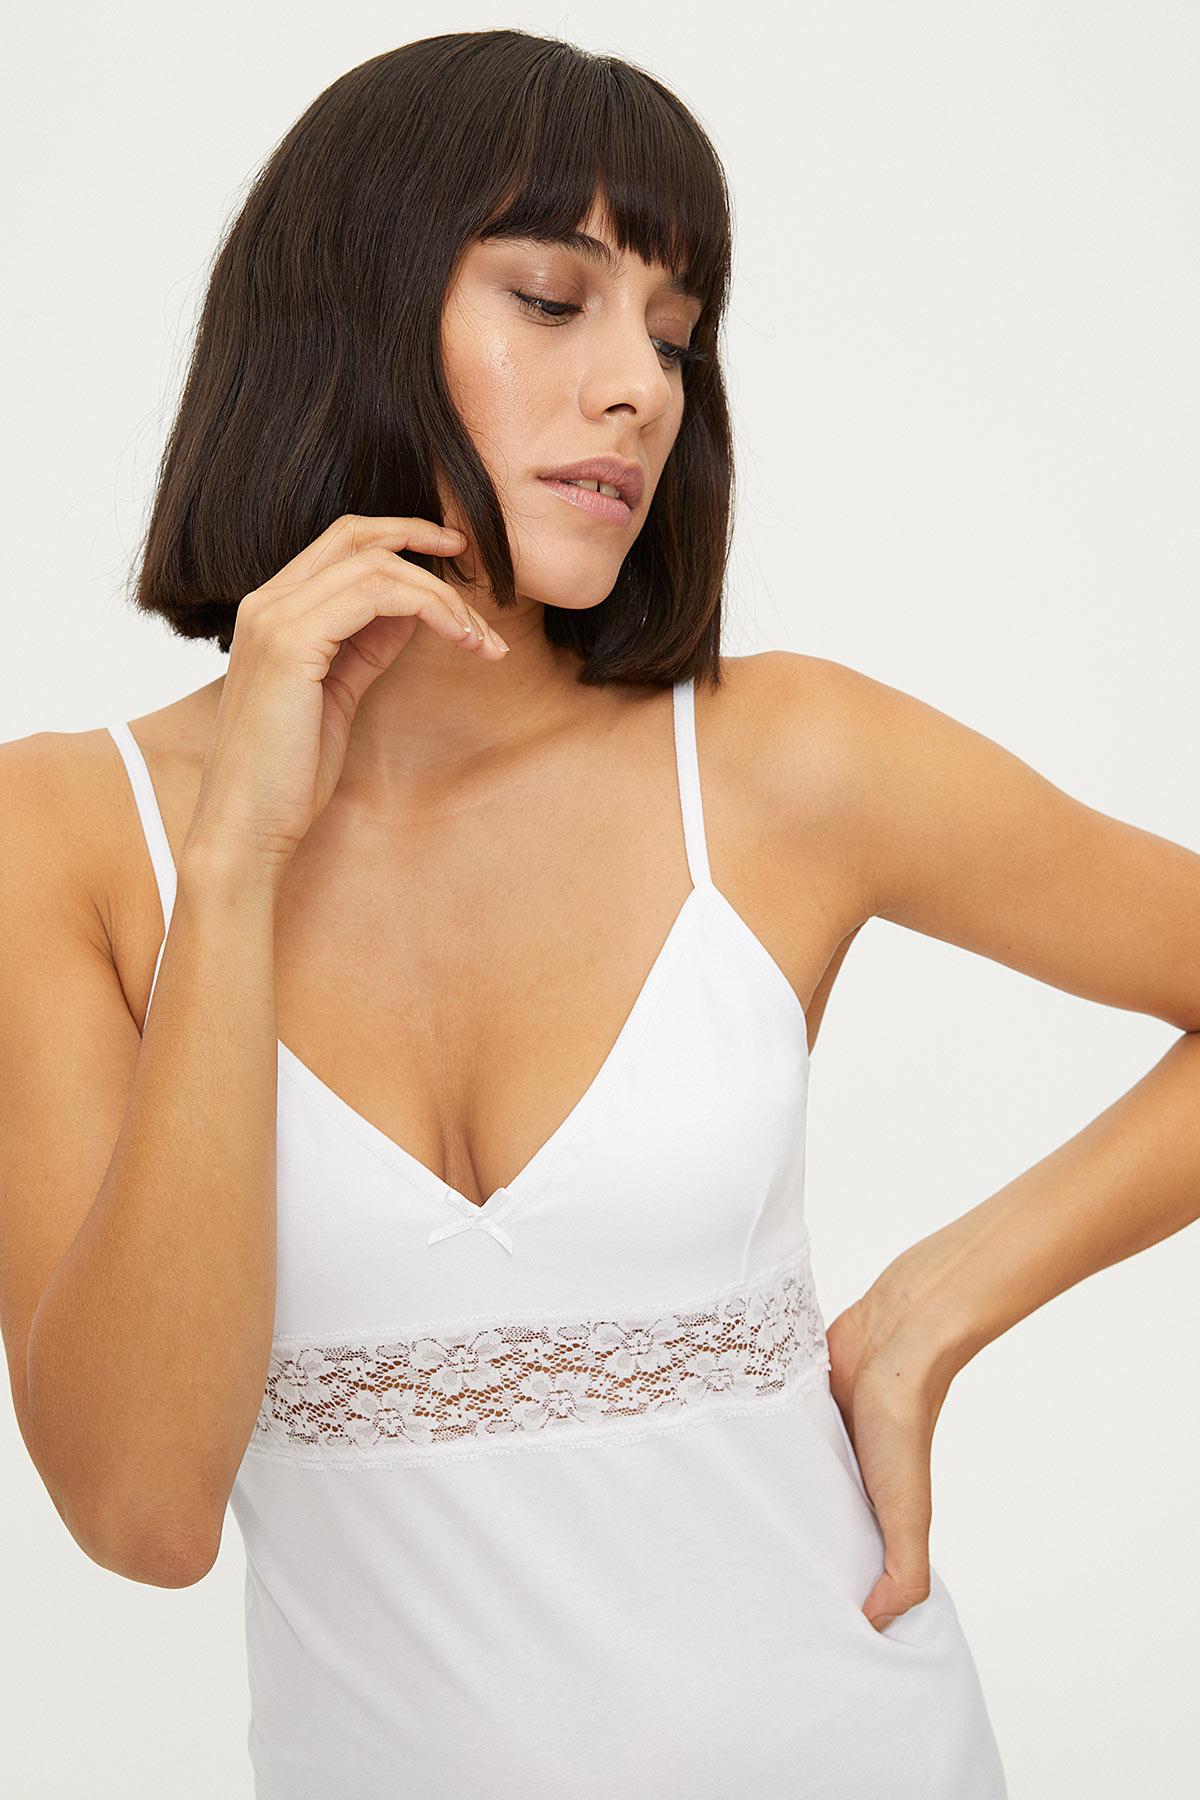 1287 Lycra Strappy Lacy Ladies Undershirt